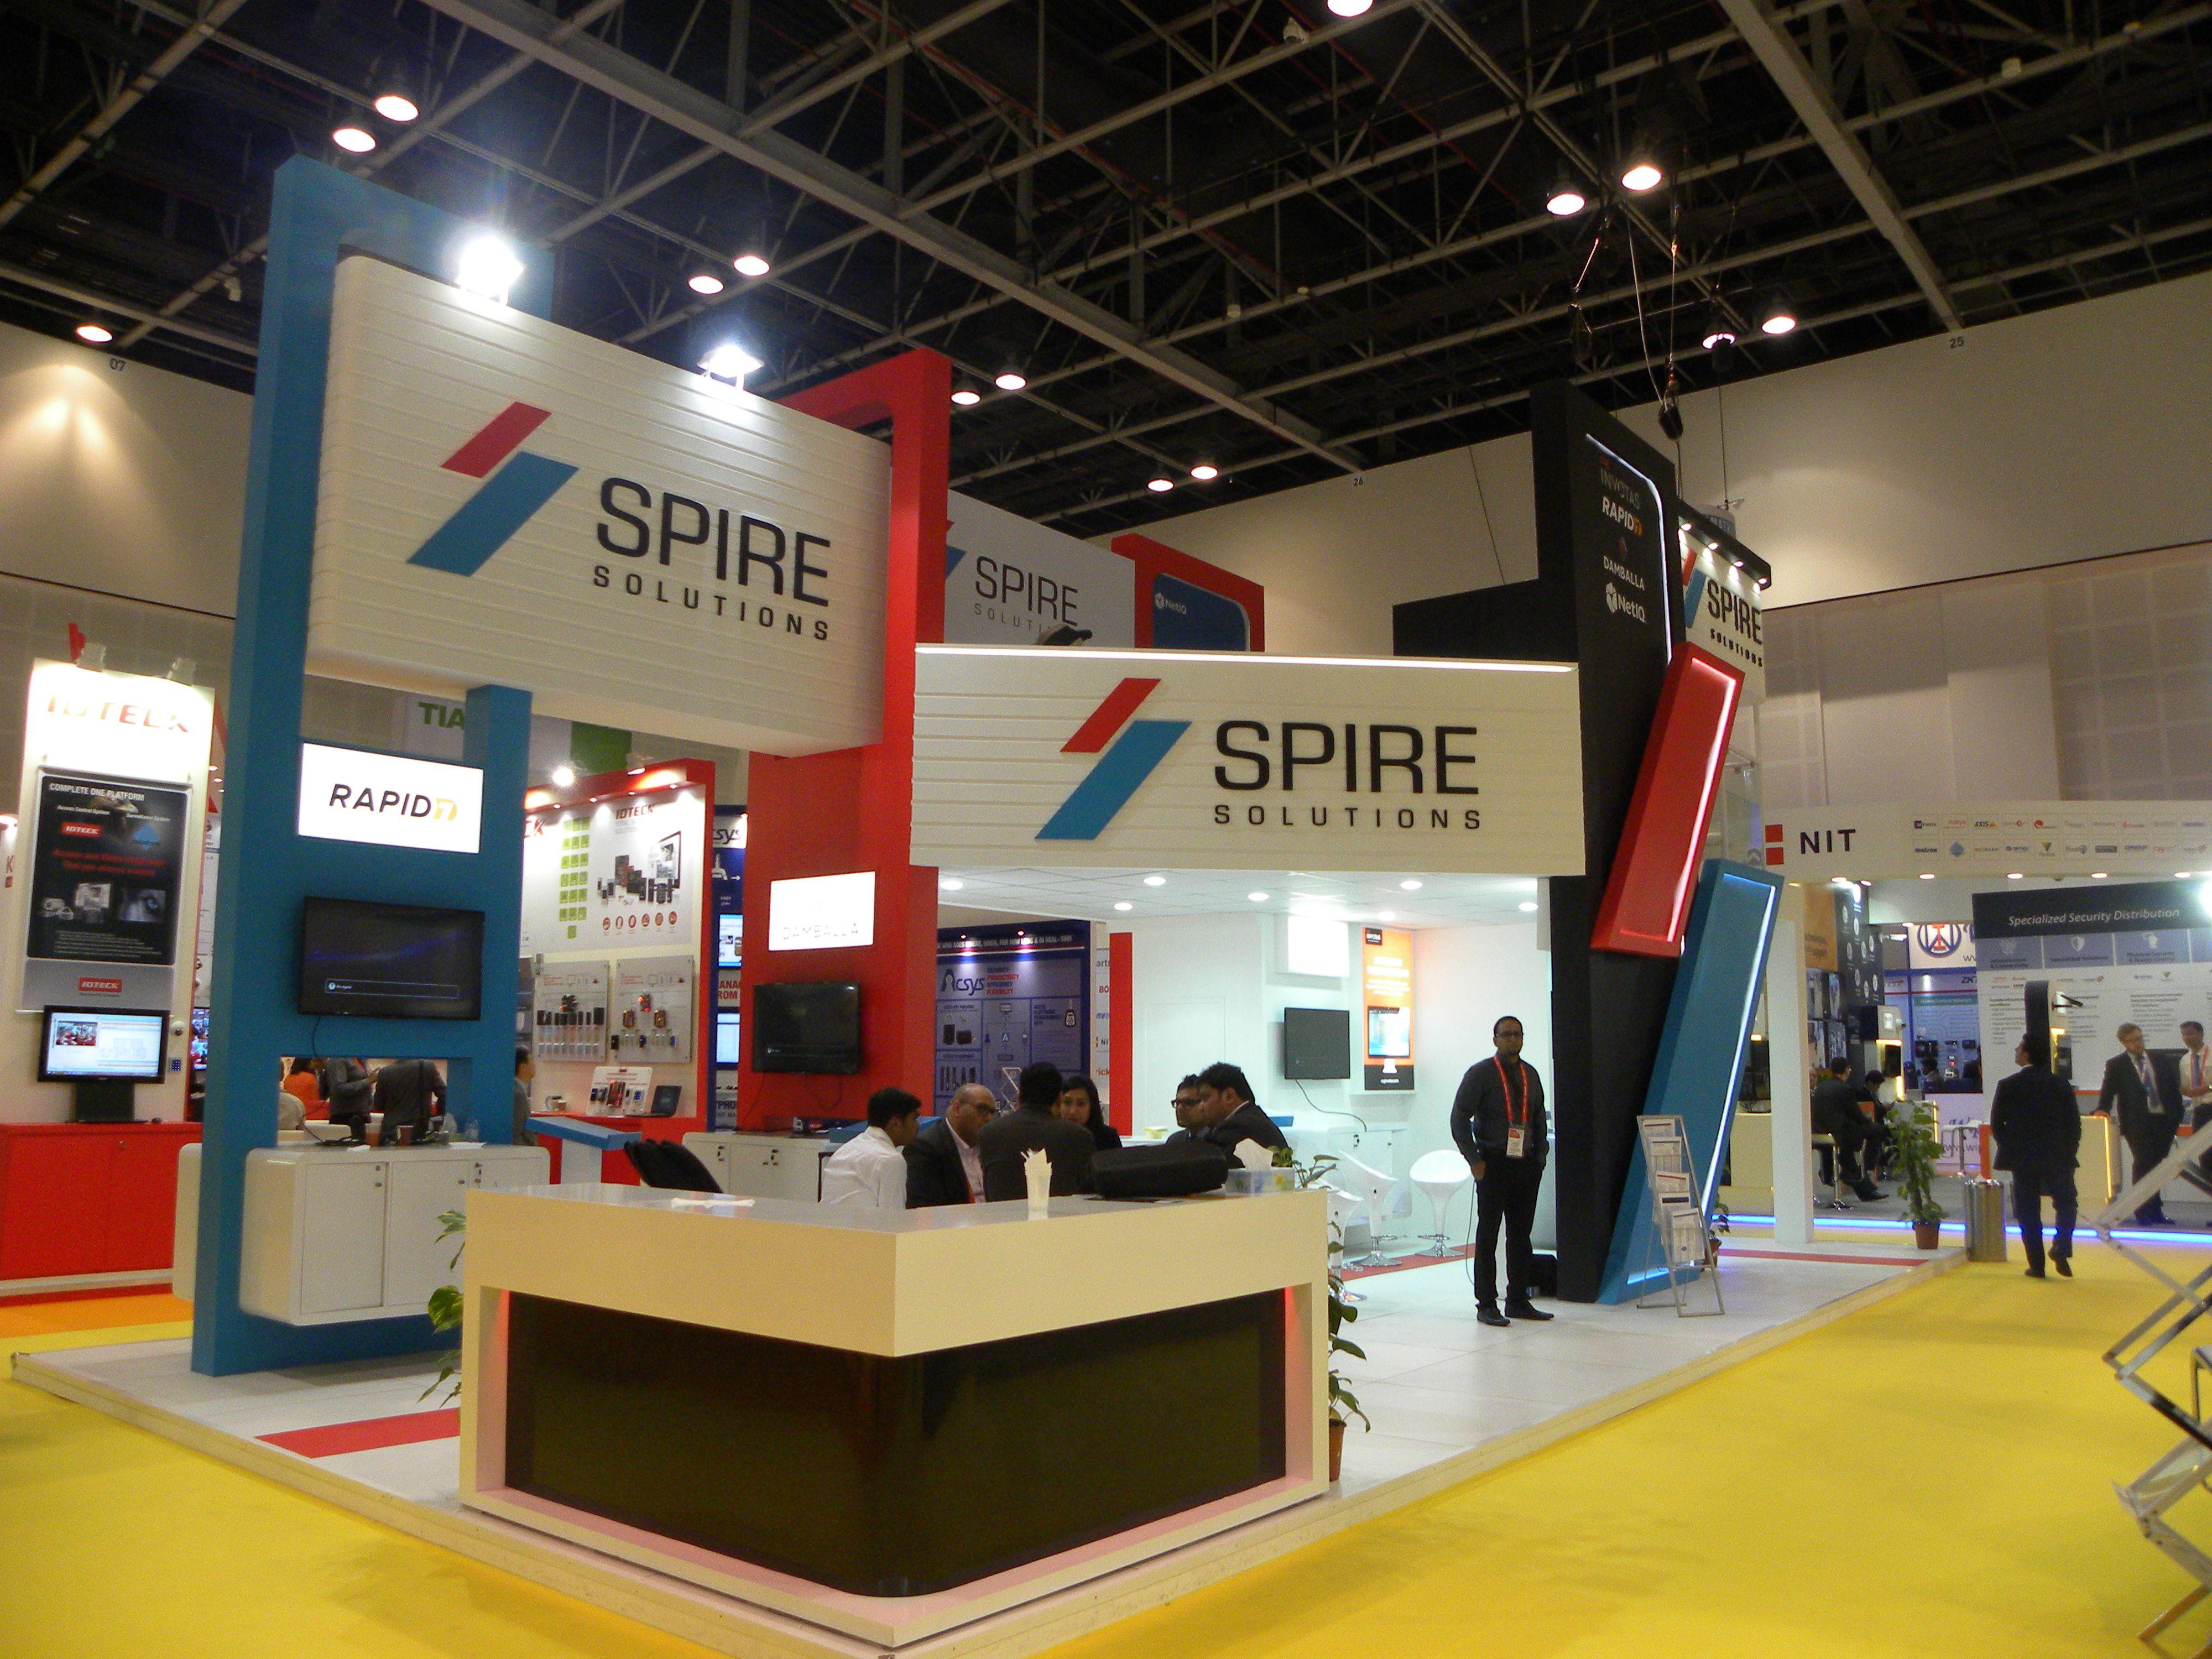 D Exhibition In Dubai : Tamam exhibition services llc dubai